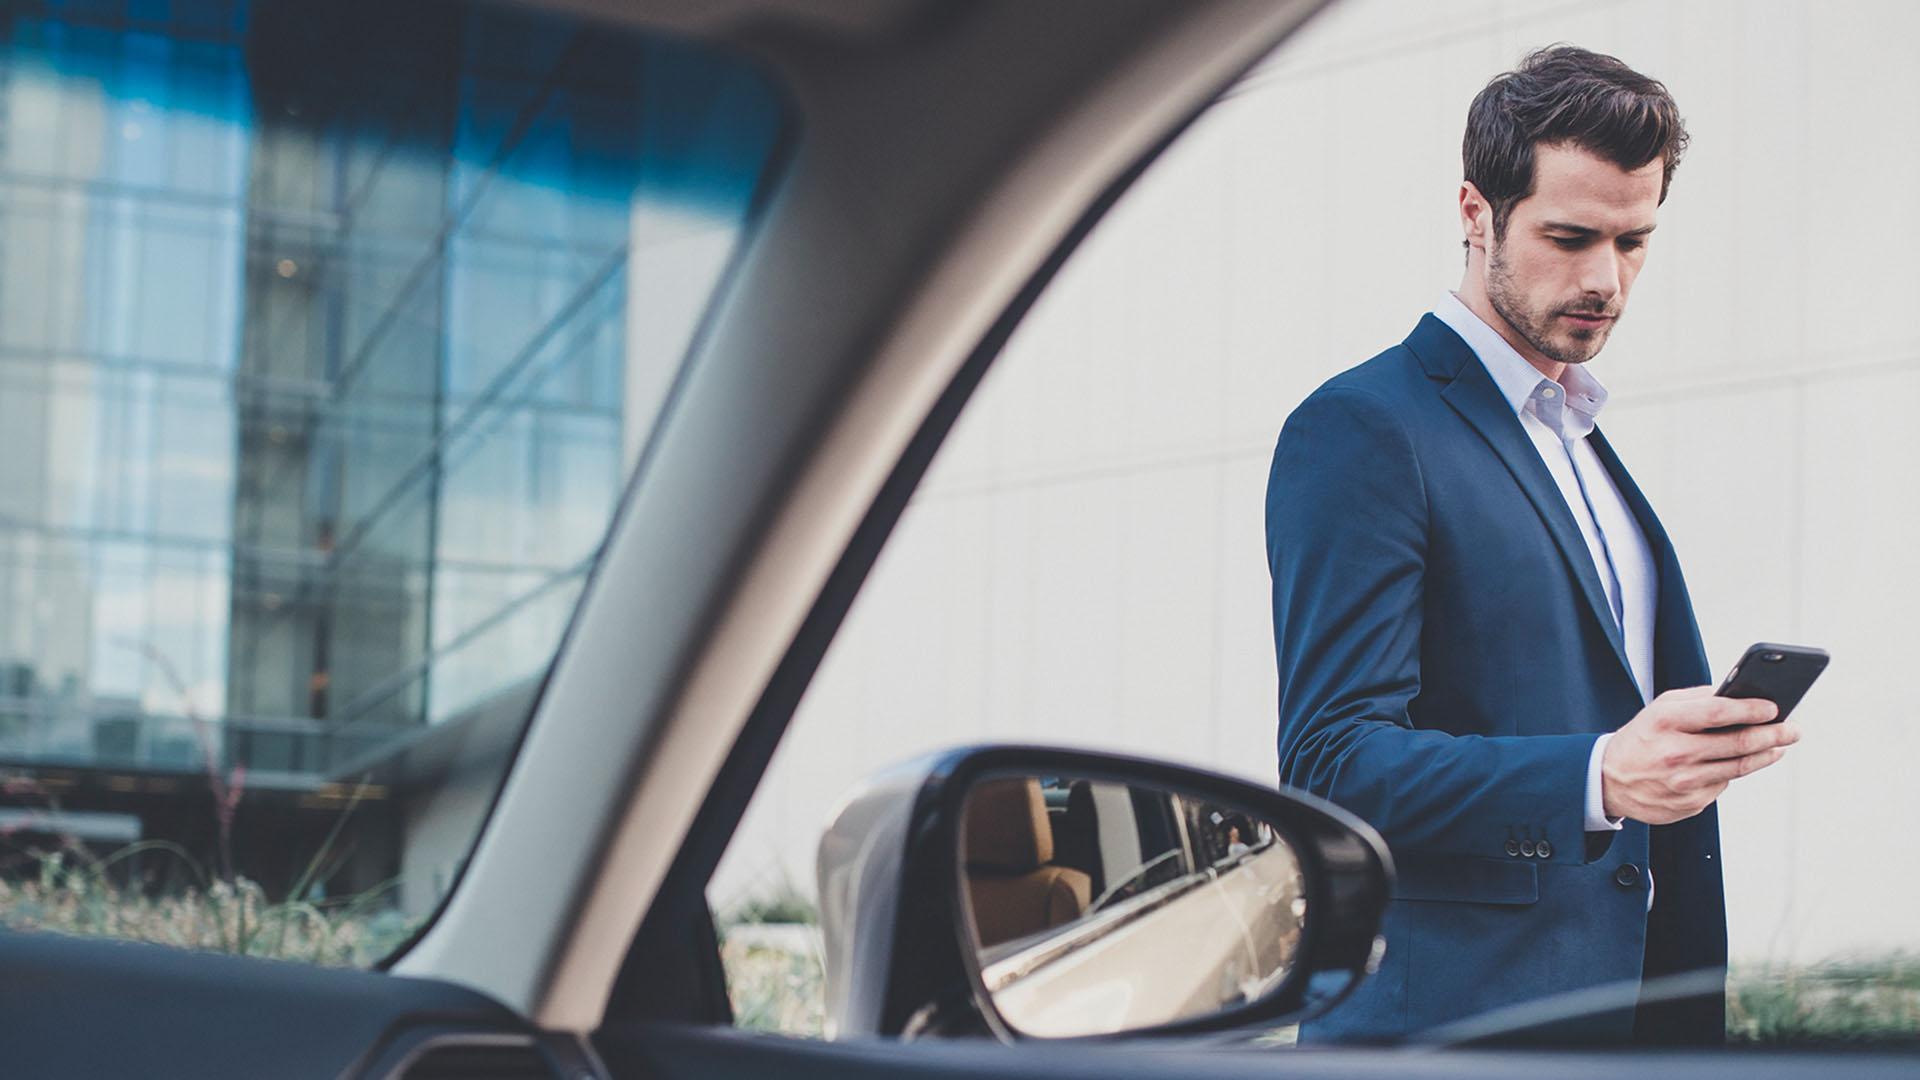 2018 lexus ownership RoadsideAssistance landscape